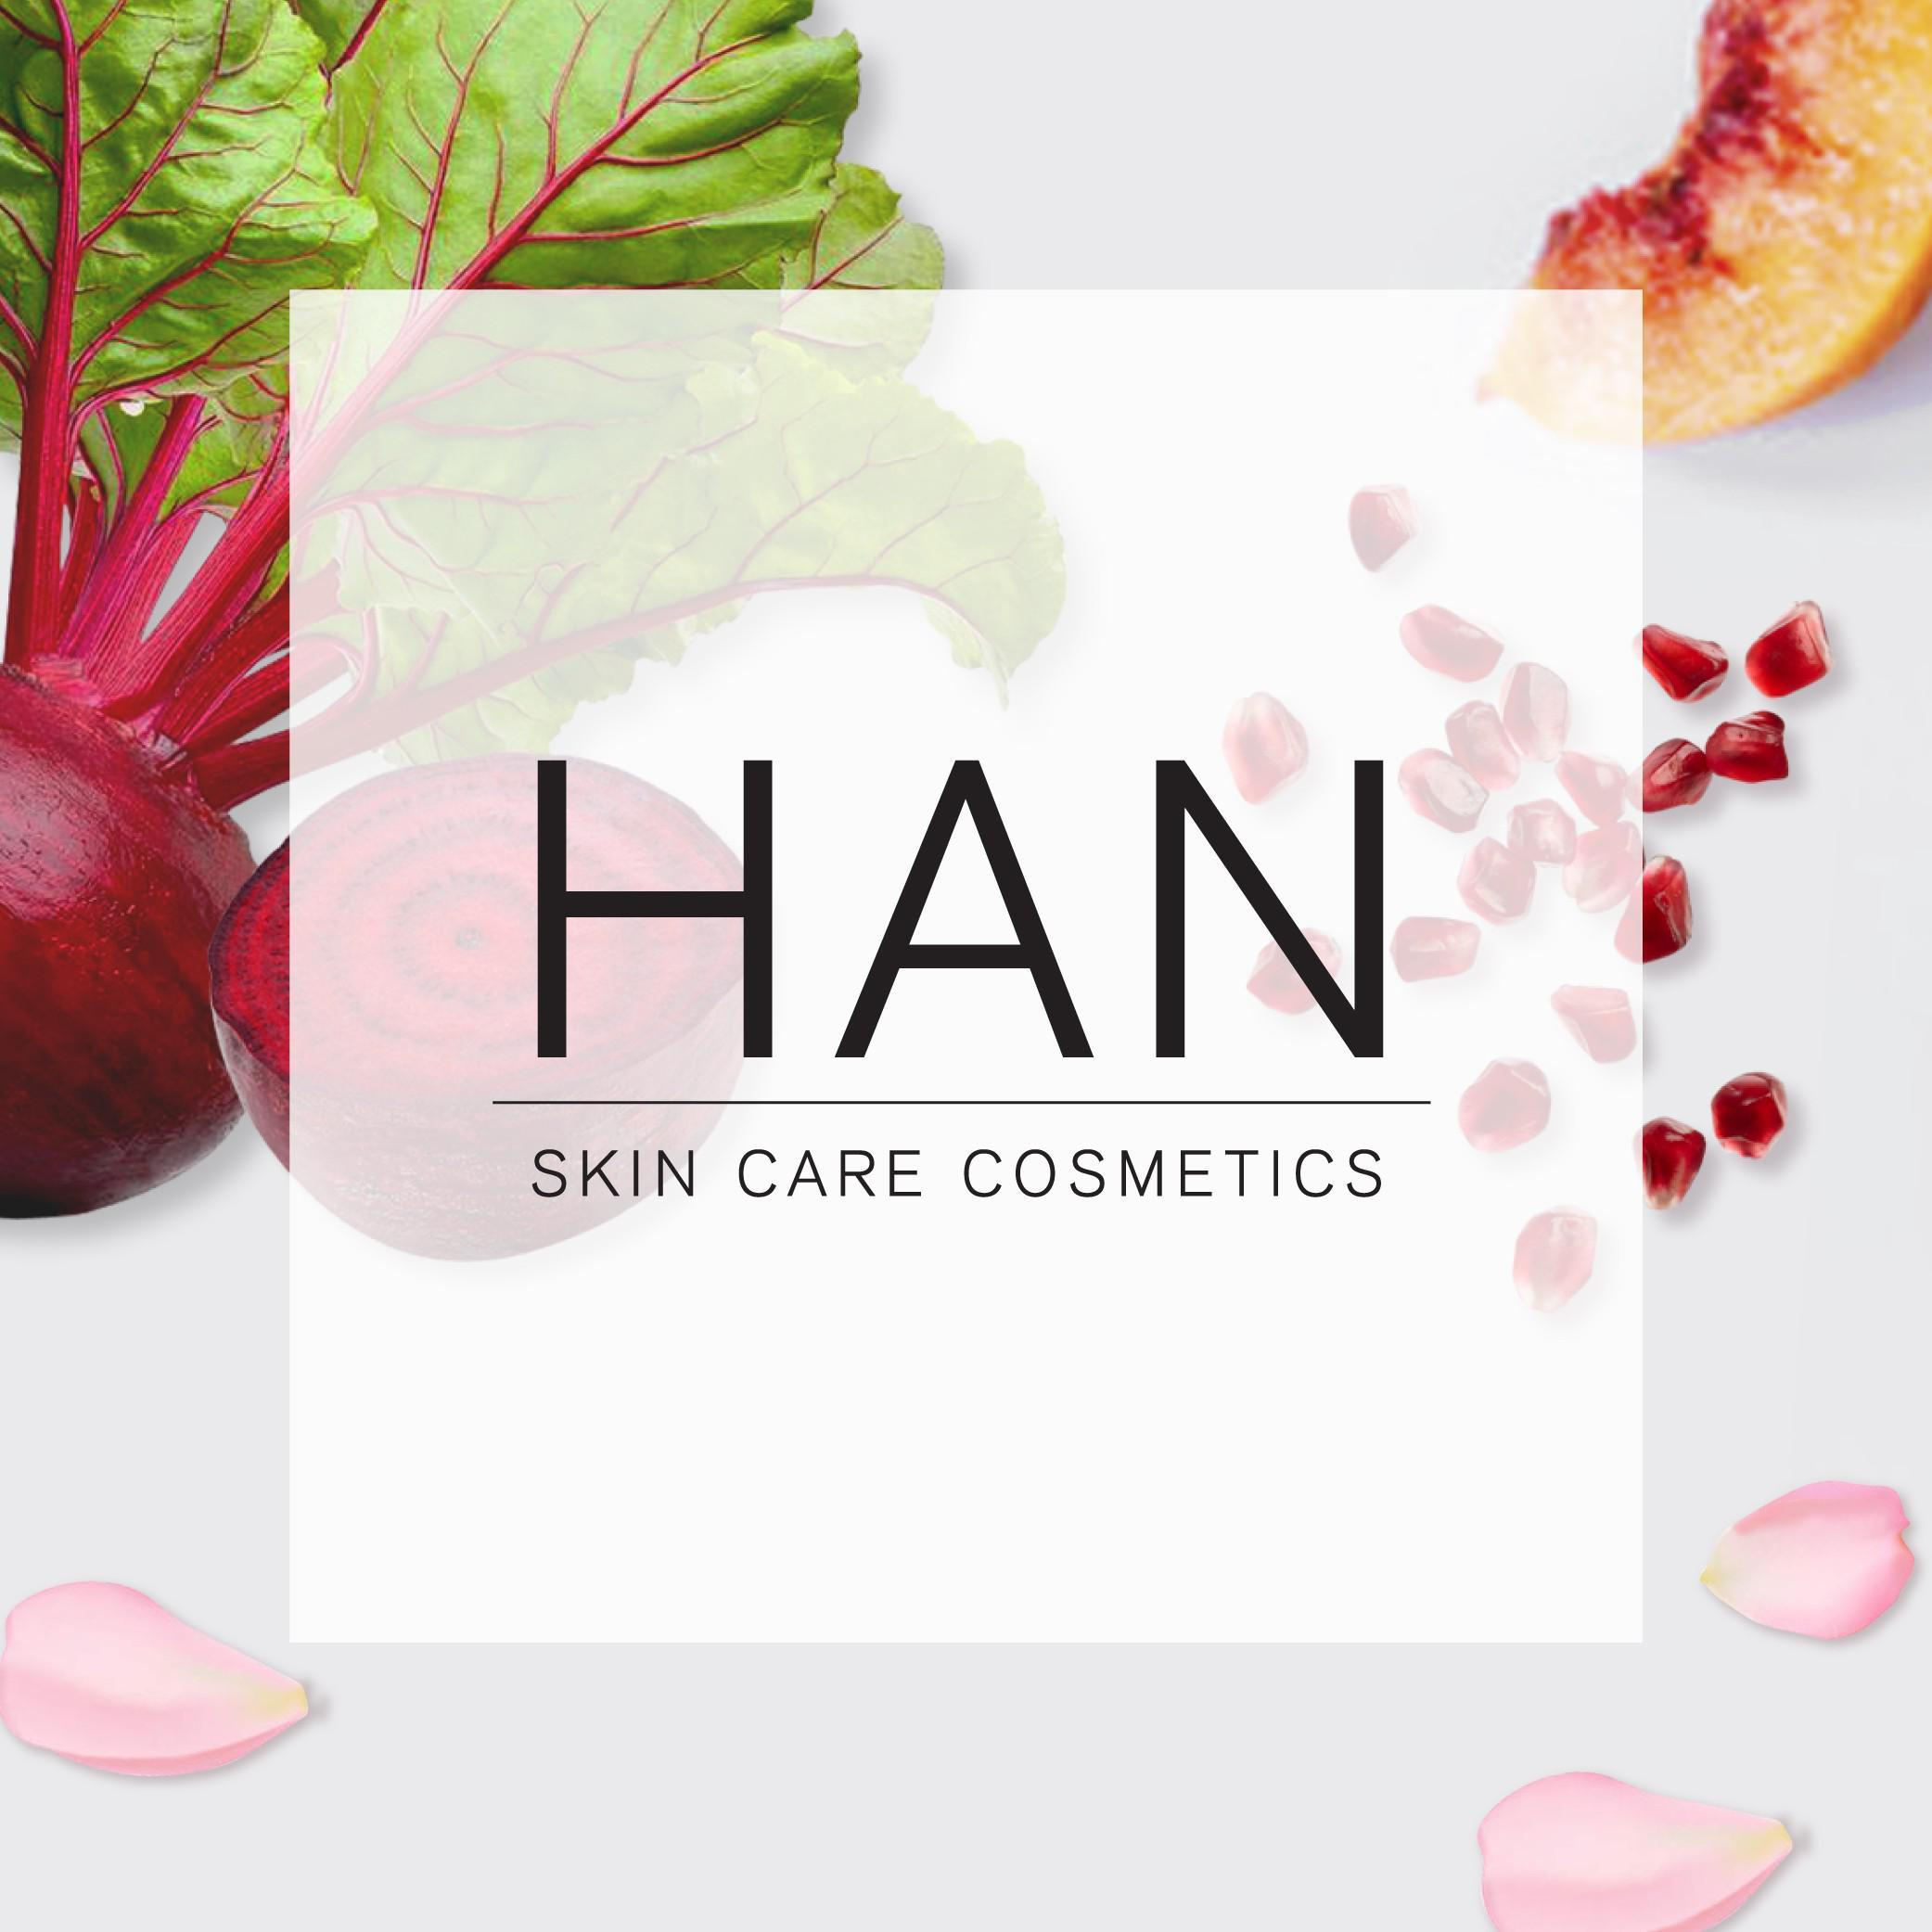 Han Cosmetics